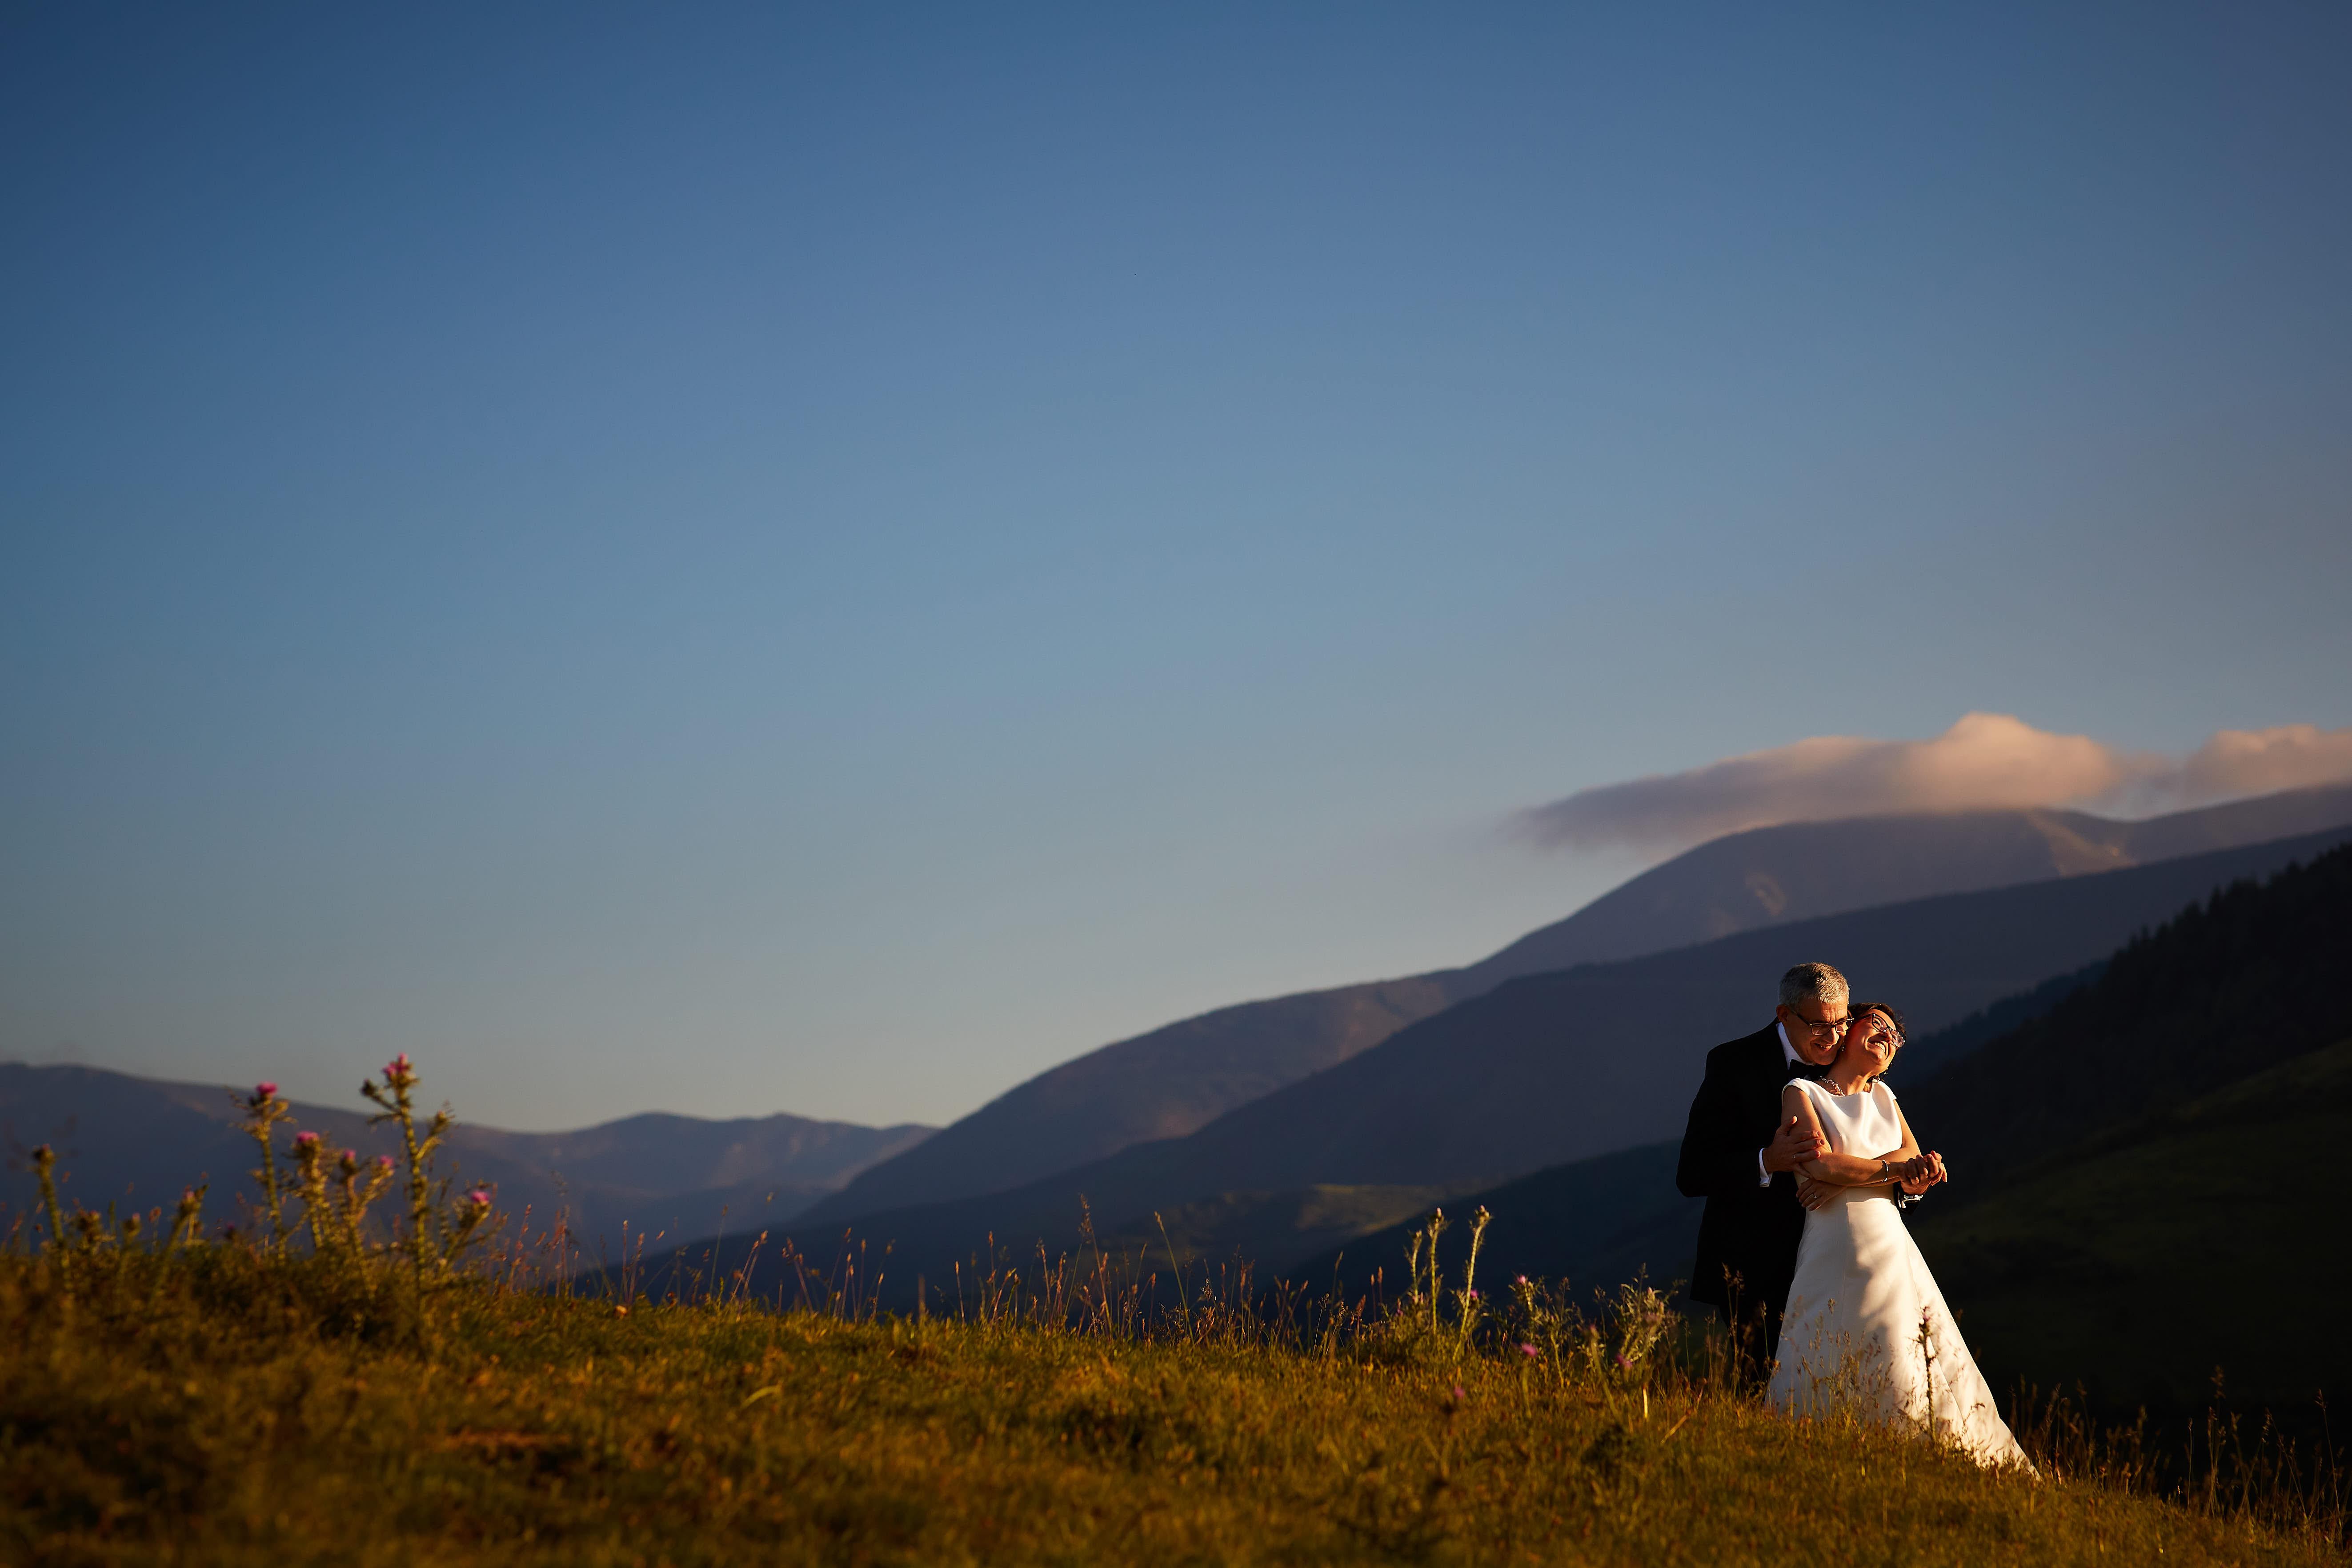 La Arboleda del Sur del Echaurren. Tu boda en la naturaleza